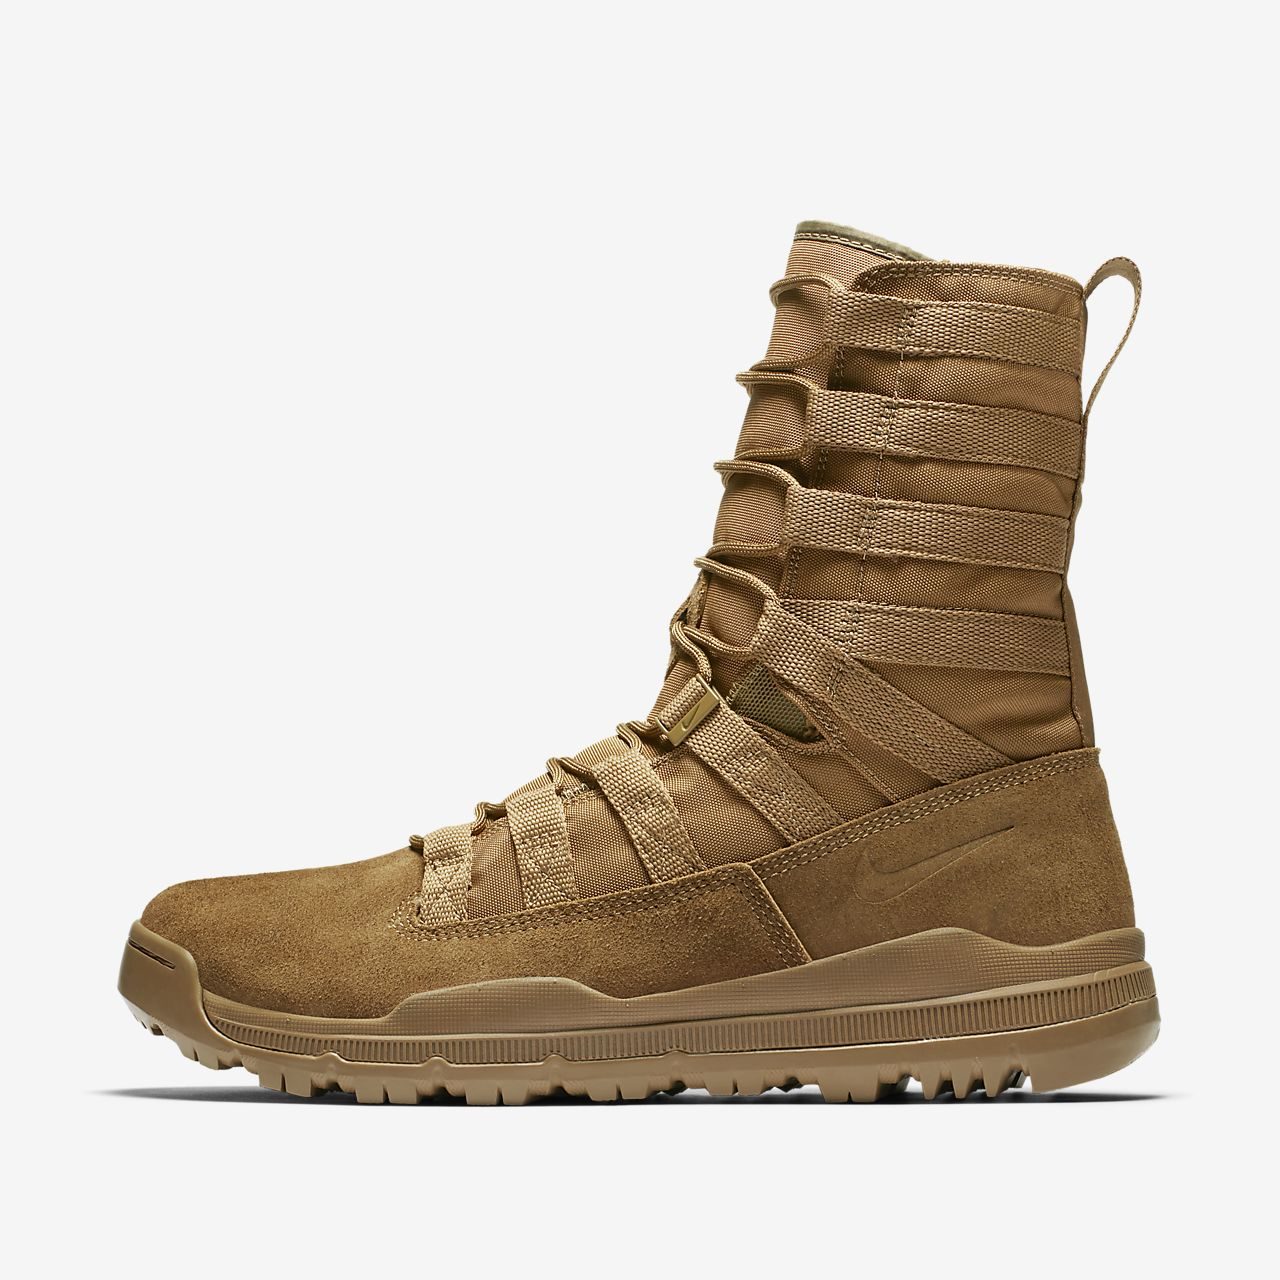 Nike Sfb Gen 2 Lt 8 Quot Outdoor Training Boot Nike Com